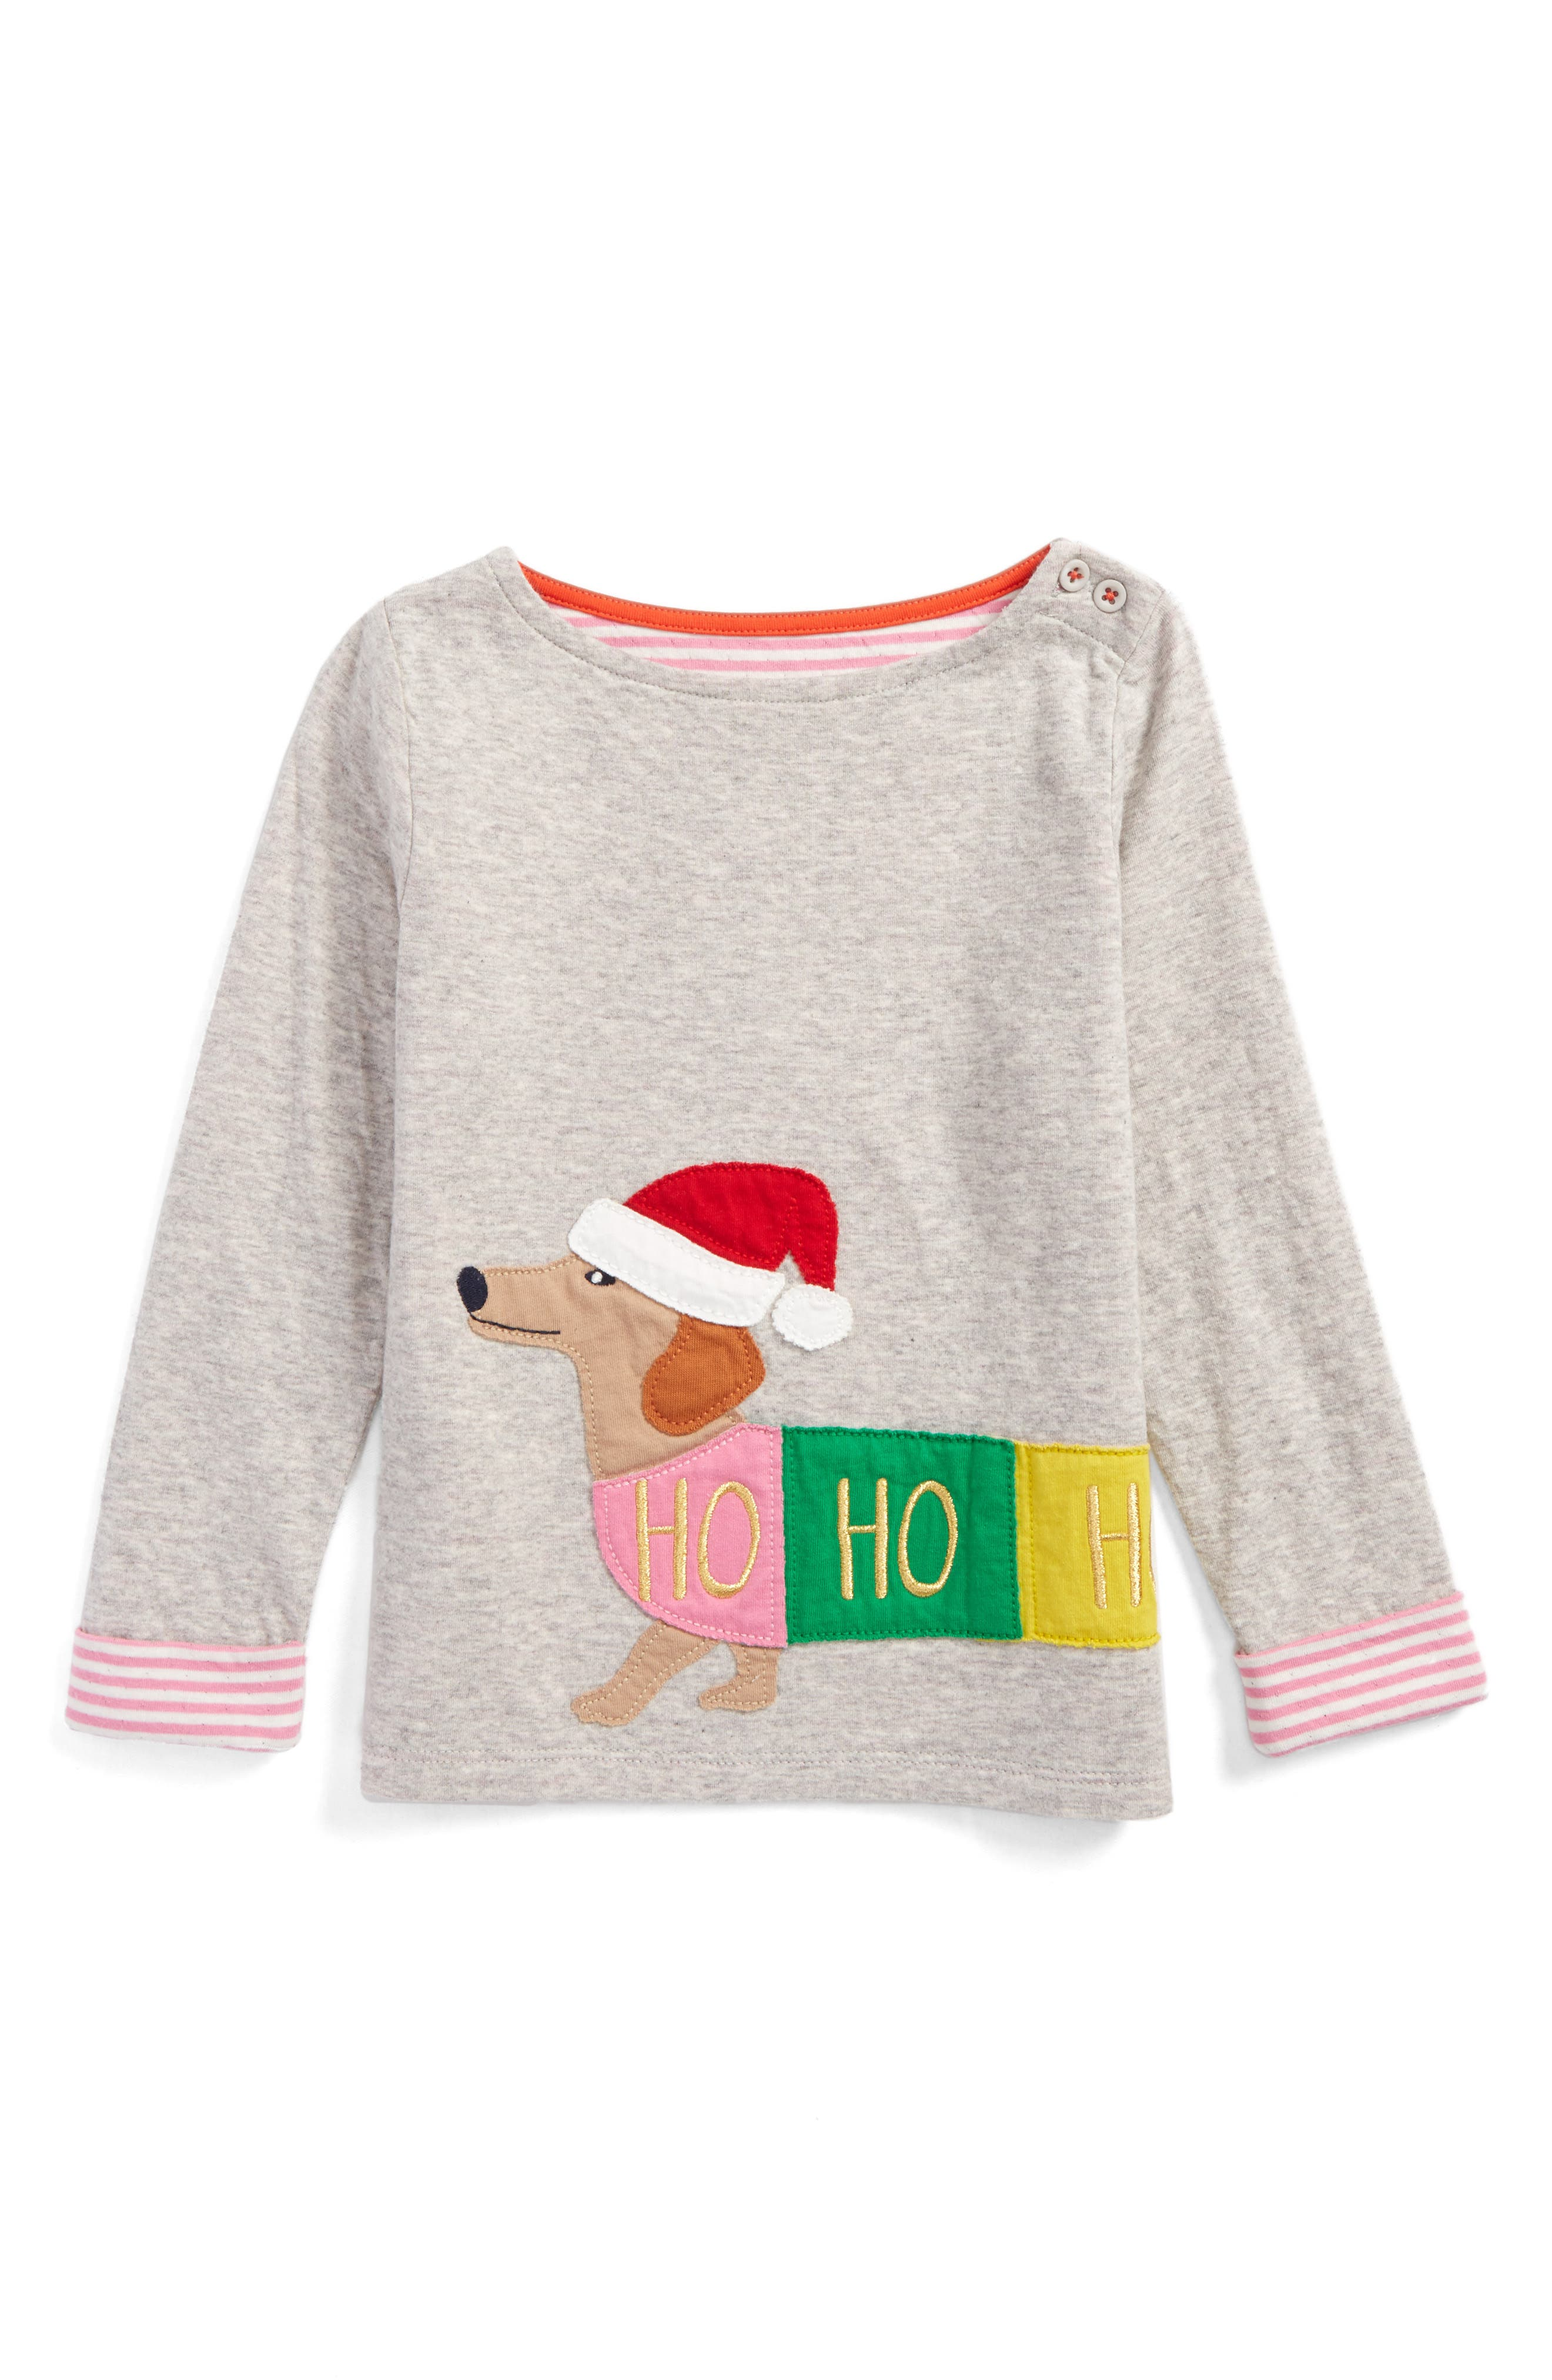 Alternate Image 1 Selected - Mini Boden Cosy Appliqué Tee (Toddler Girls, Little Girls & Big Girls)